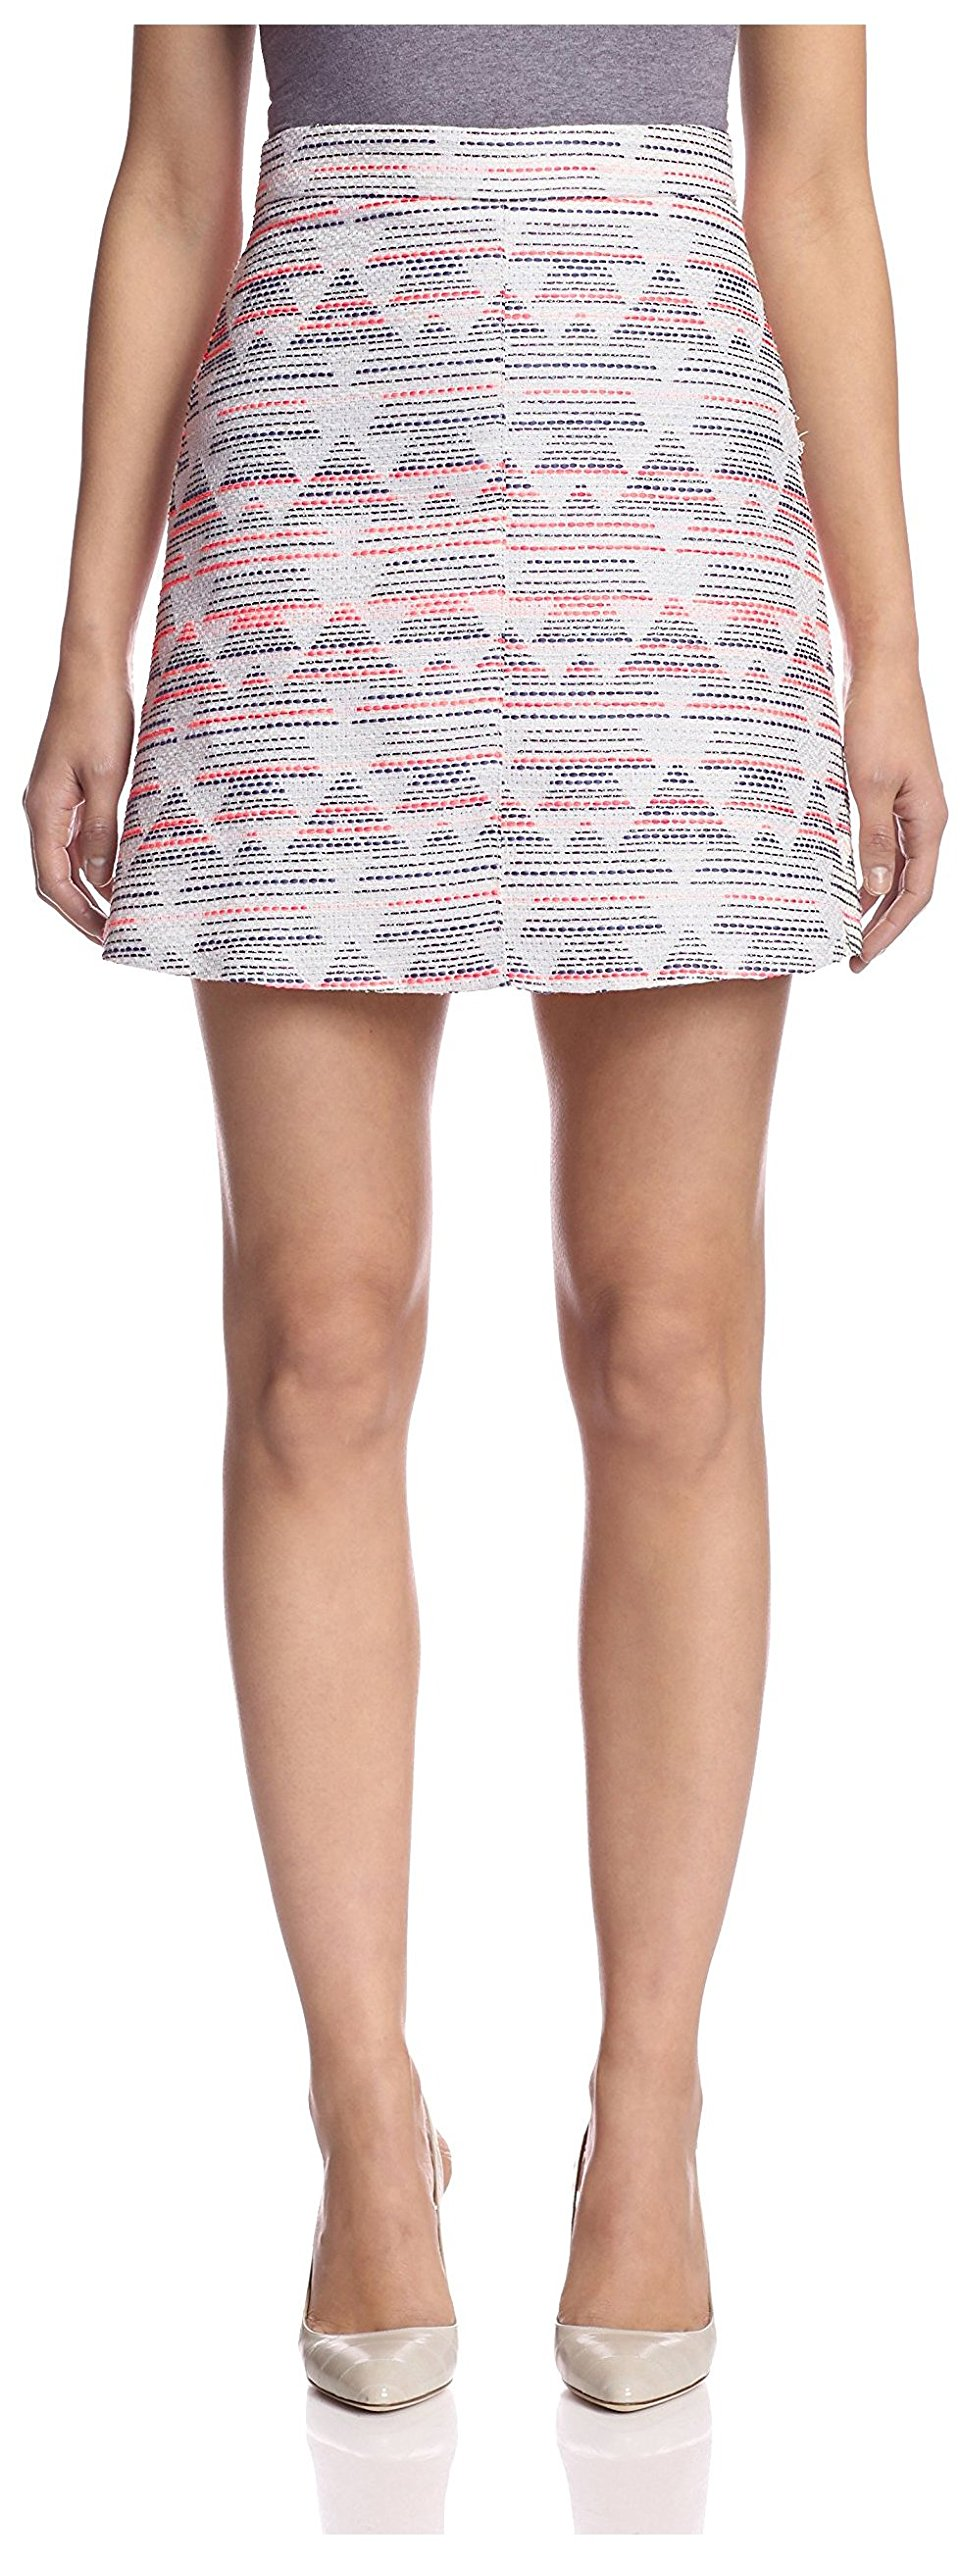 Hutch Women's Jacquard A-Line Skirt, Pink/Multi, 8 US